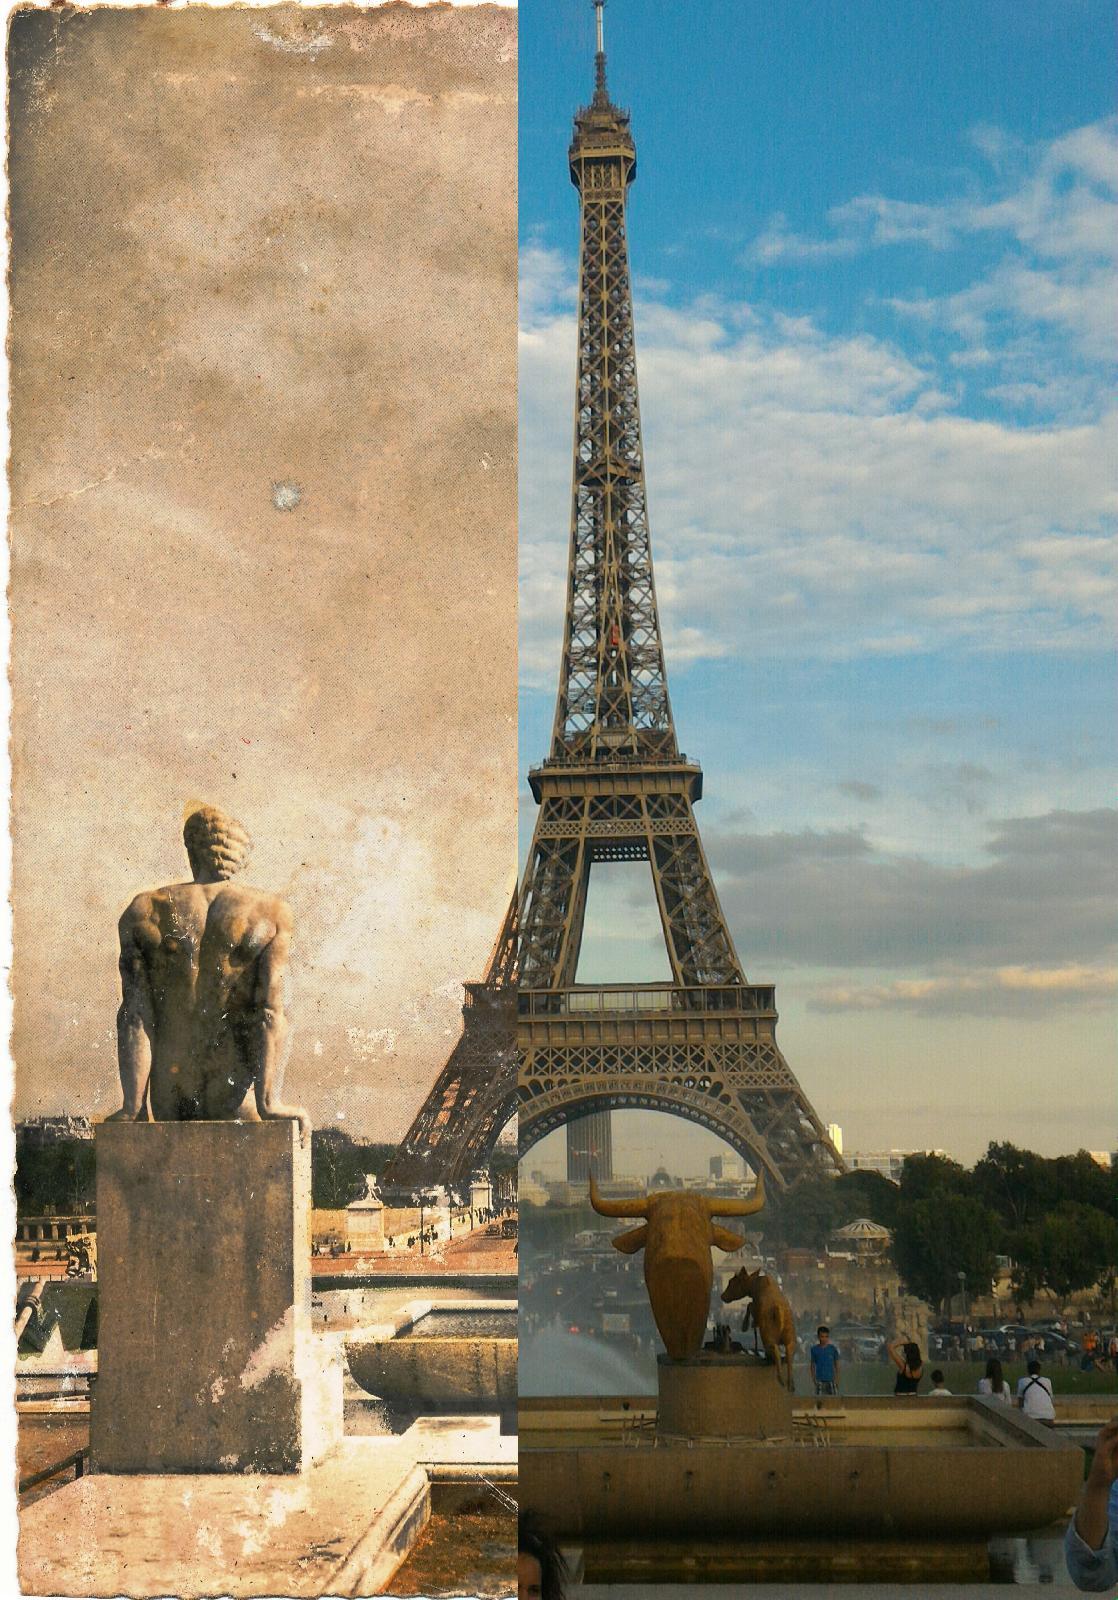 Paris - Tour Eifel